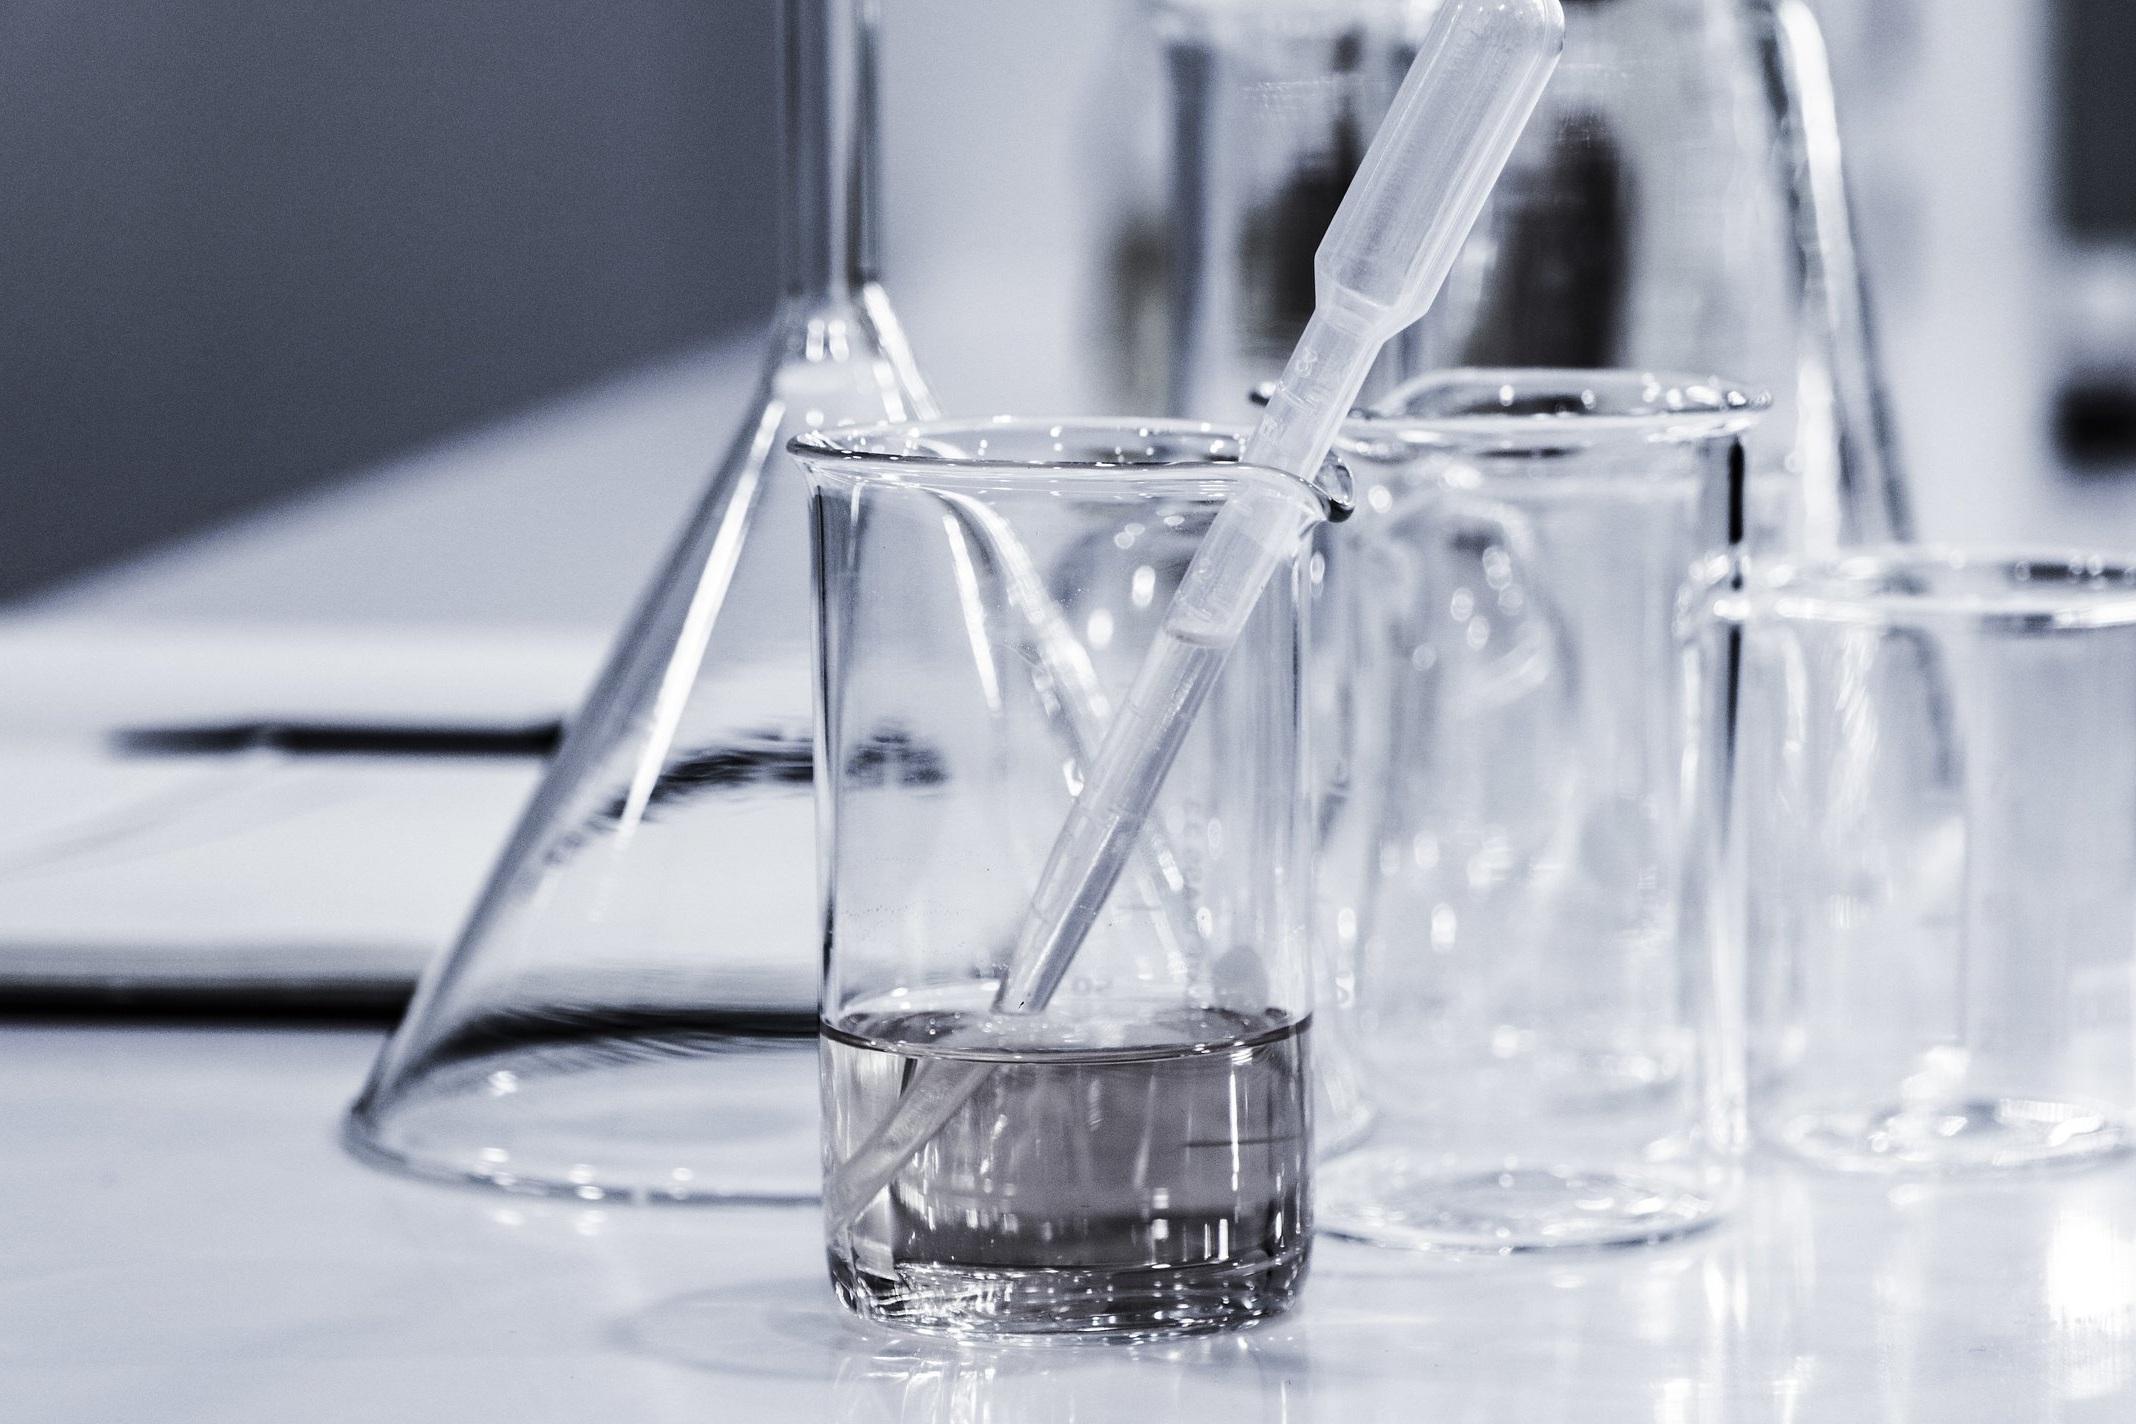 md-phd-laboratory.jpg